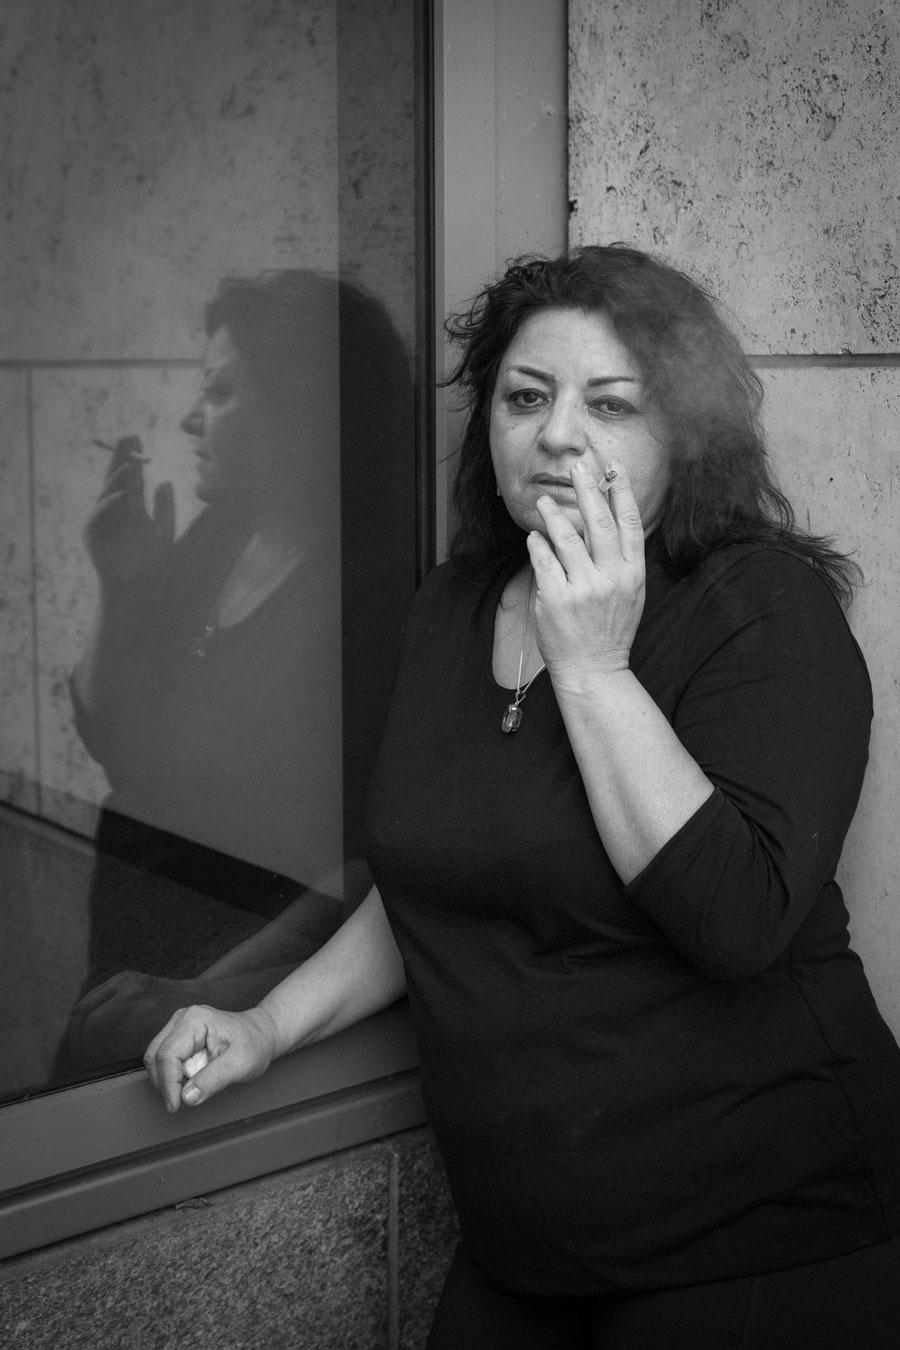 Rasha Omran, Berlin, Germany, January, 2016